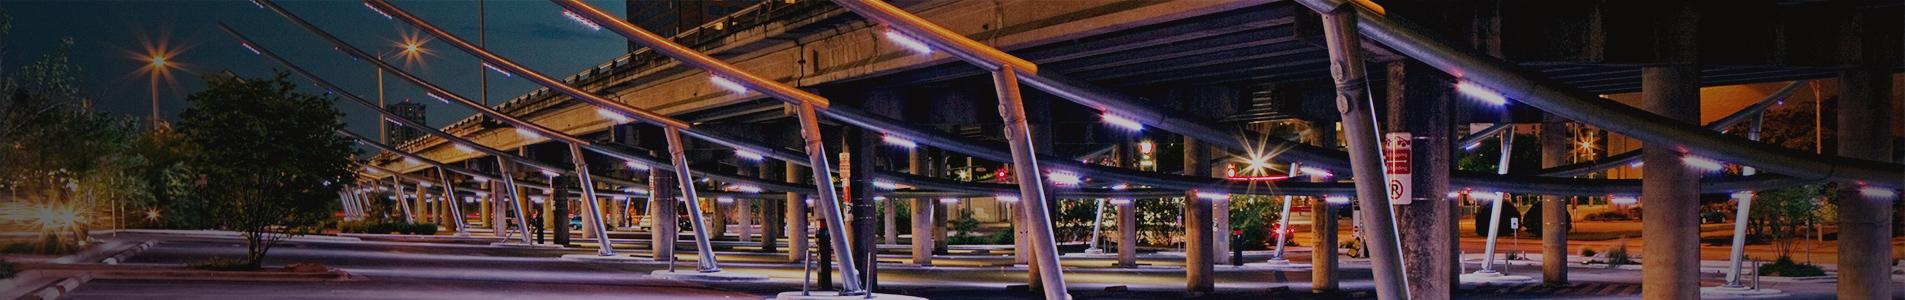 Lights near rail bridge